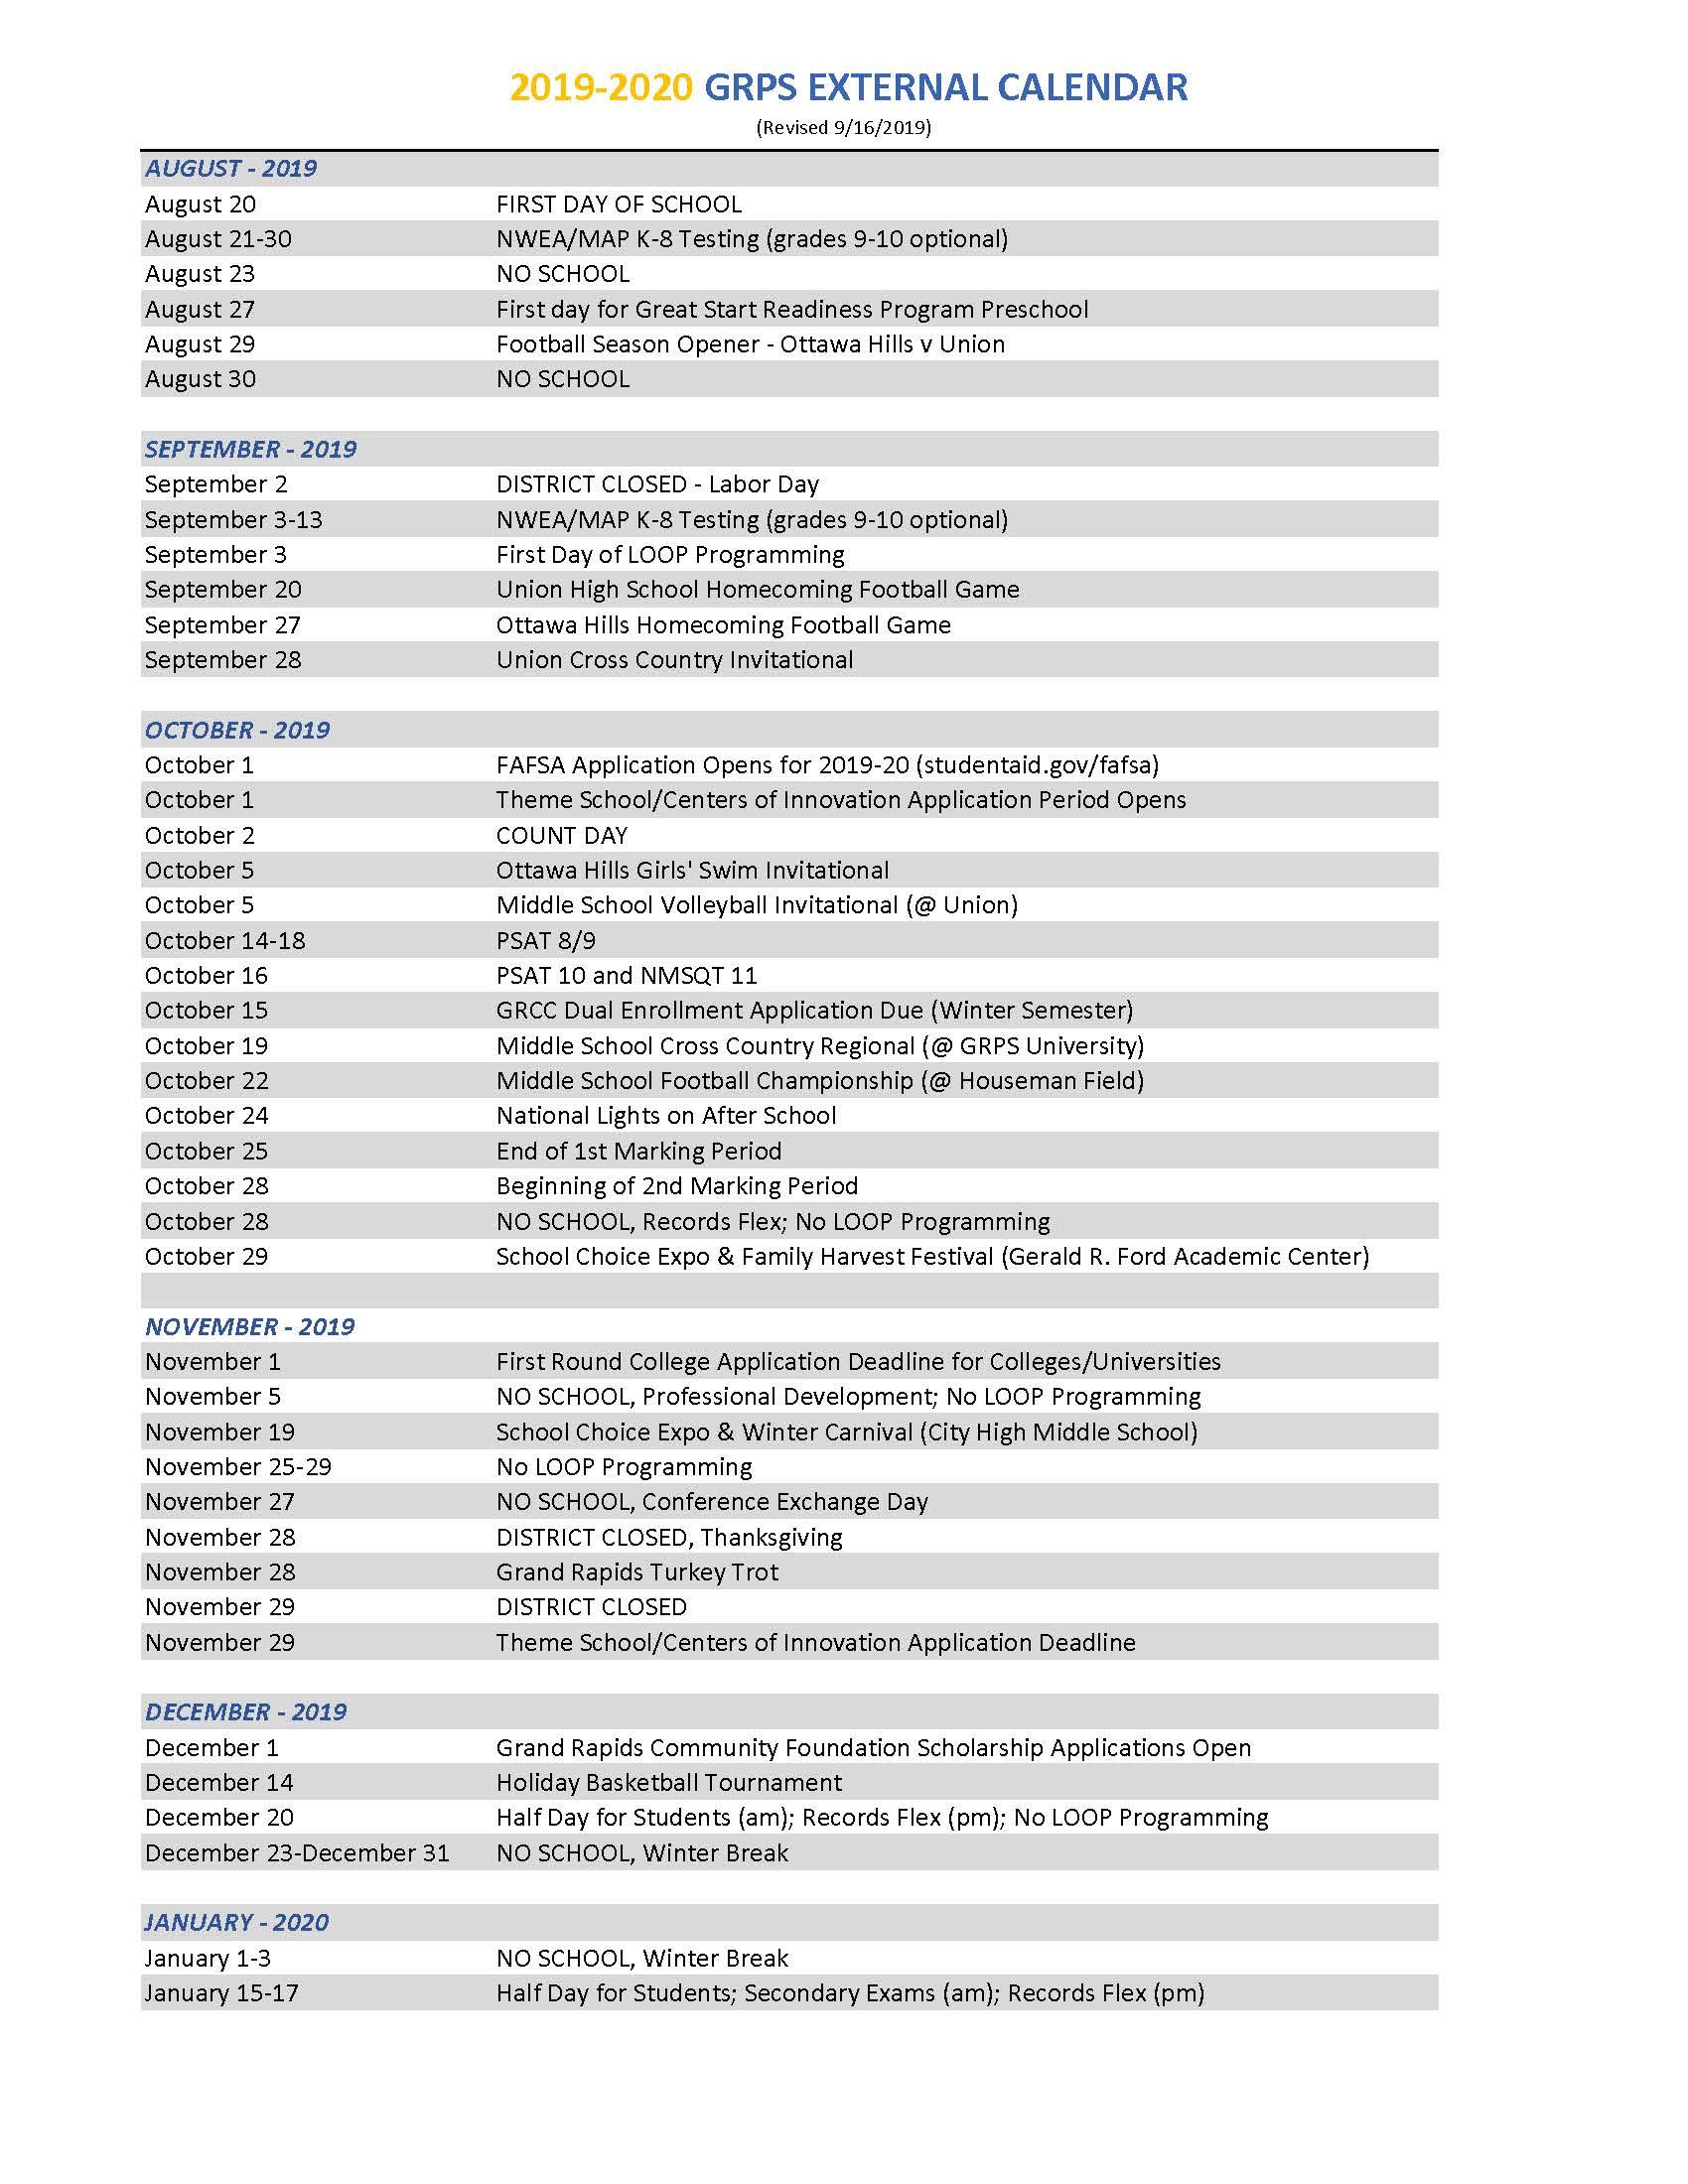 2019-2020 District Calendar regarding Grand Rapids Public School Calendar